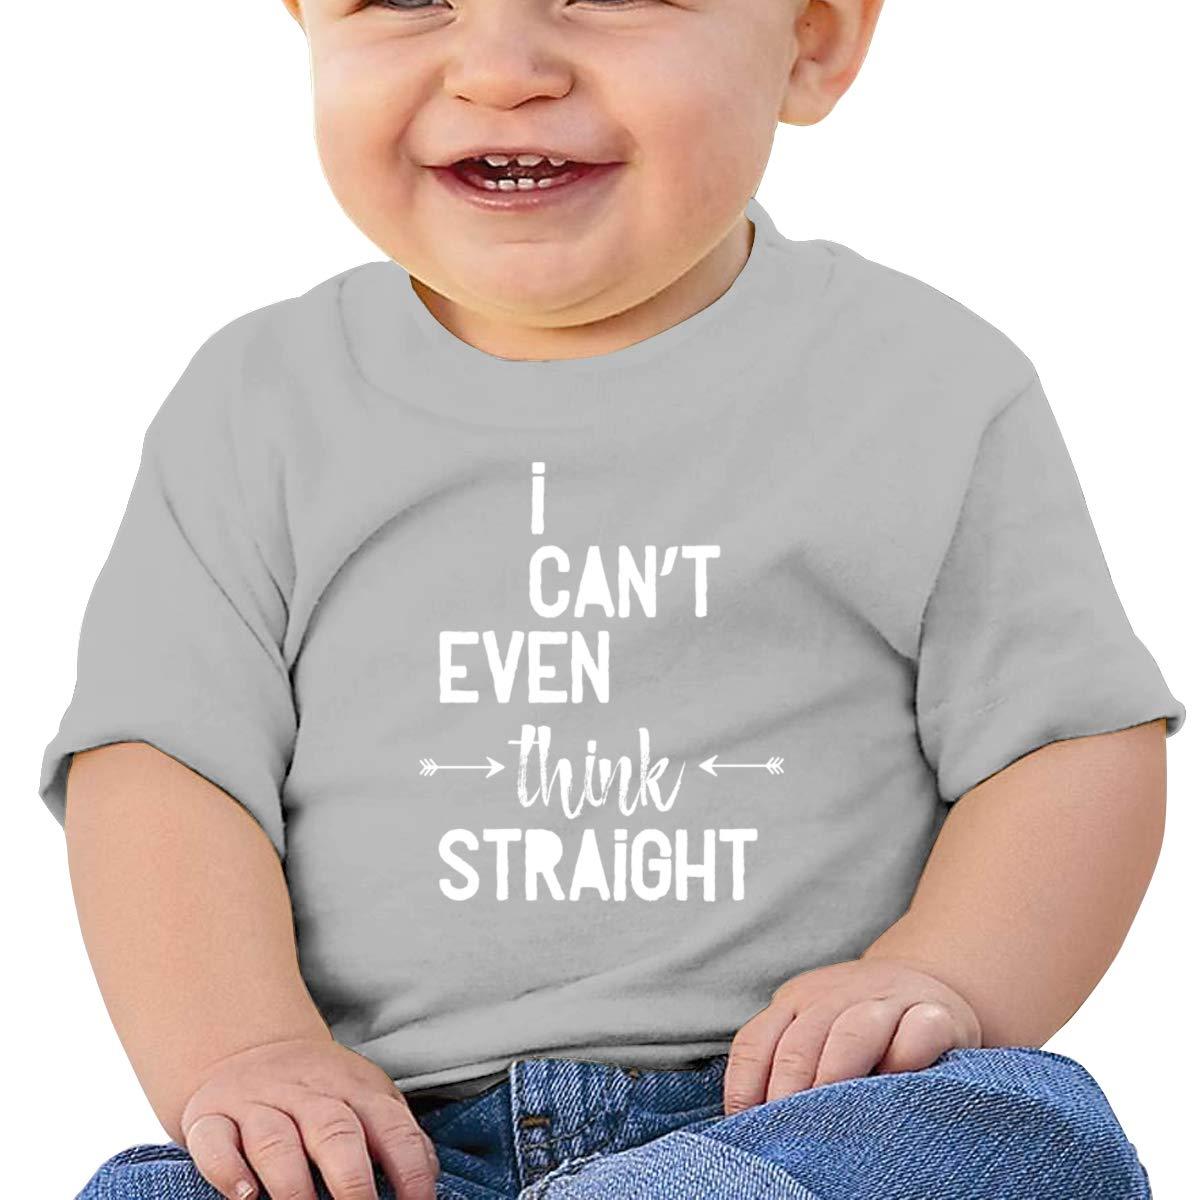 Moniery I Cant Even Think Straight Short Sleeves Shirt Baby Boy Kids